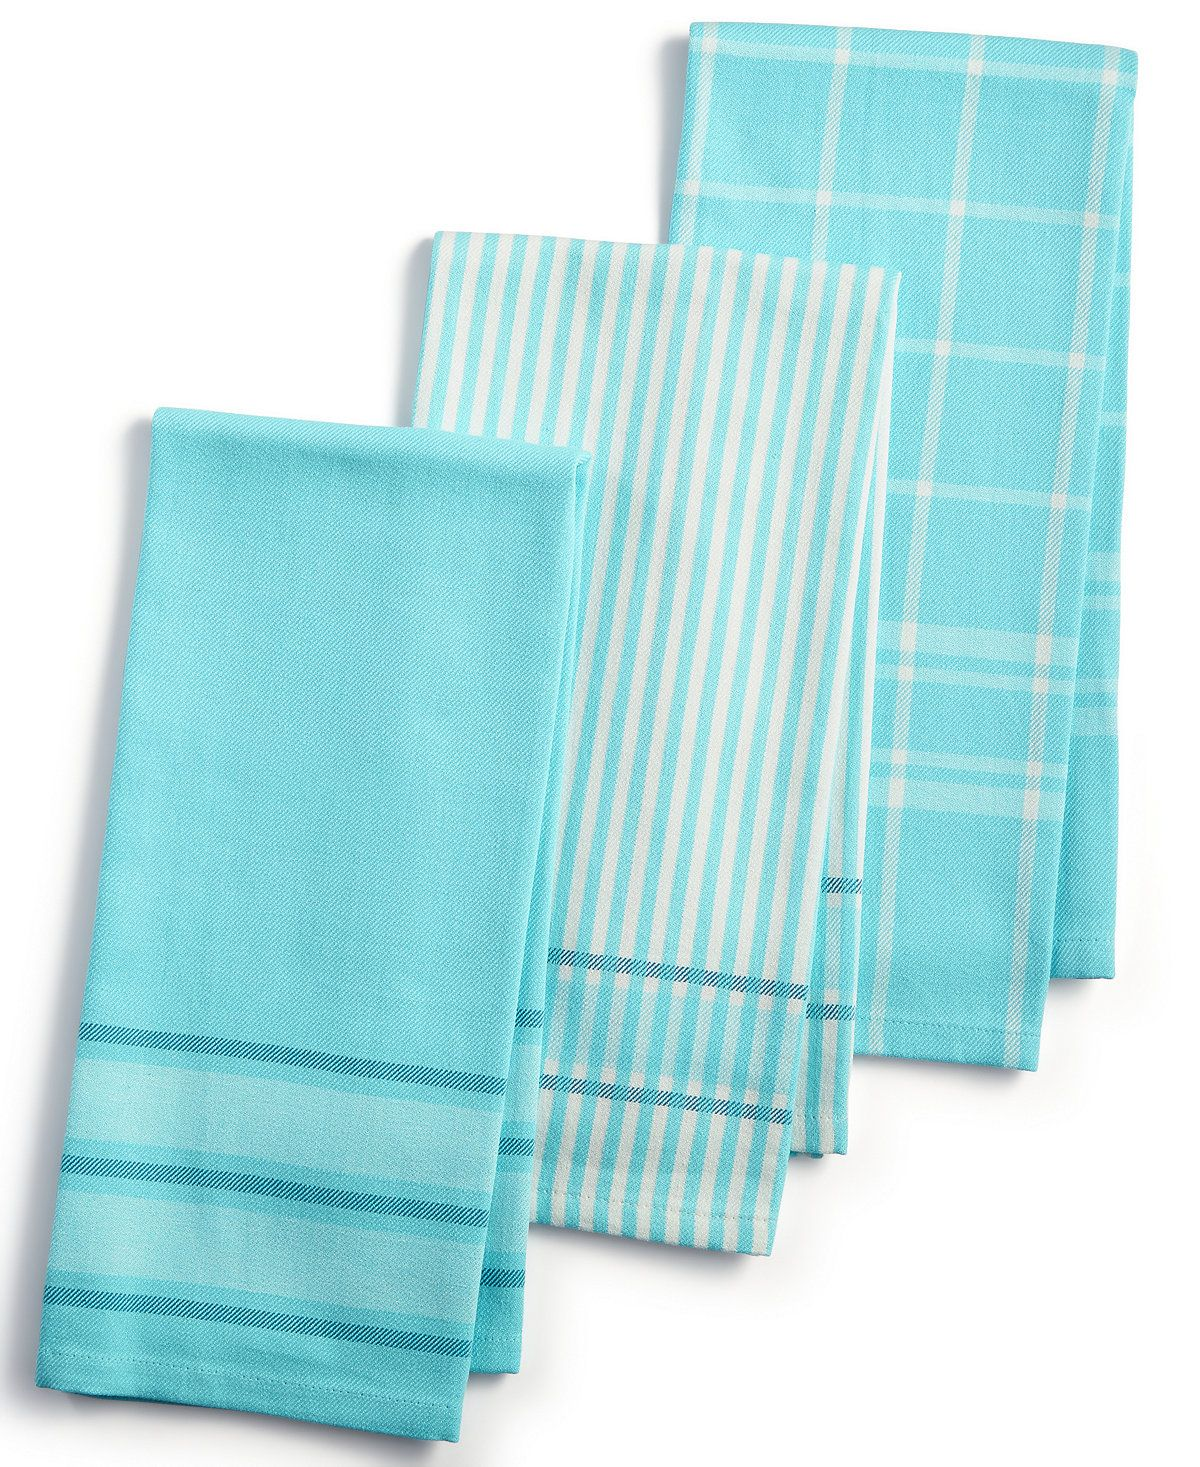 Martha Stewart Collection 3 Pc Jacquard Striped Cotton